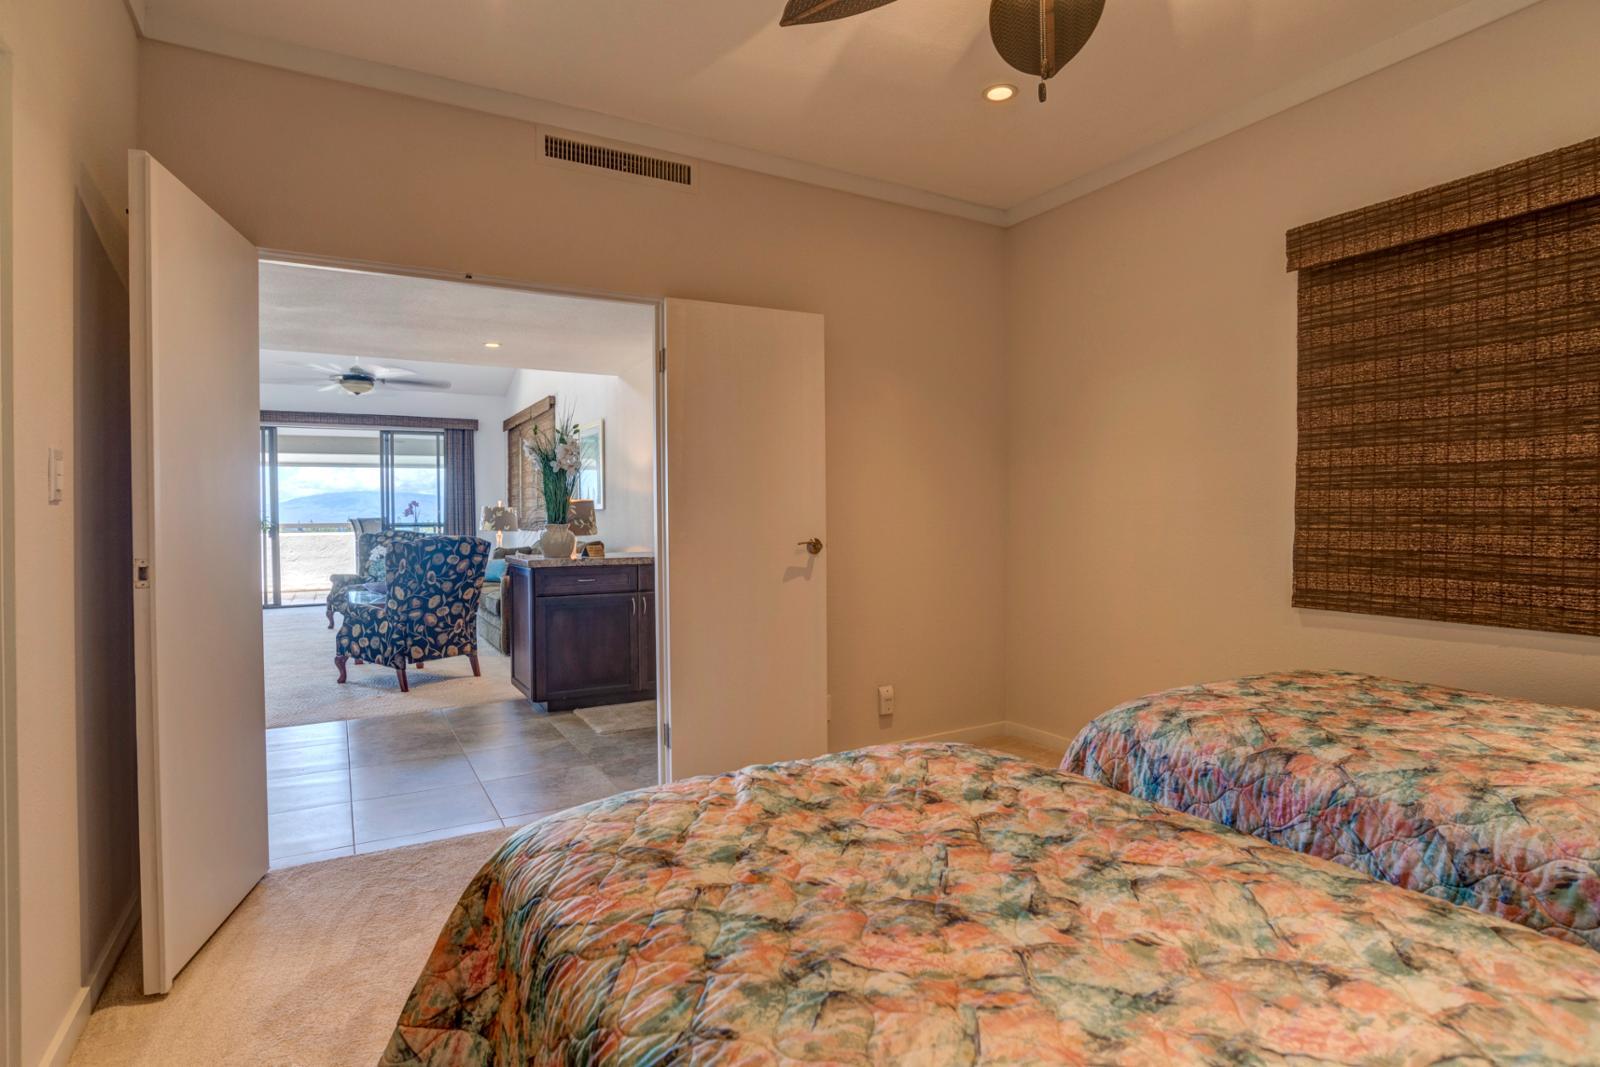 Twin beds, 1st floor bedroom with adjacent bathroom Jack n Jill entry